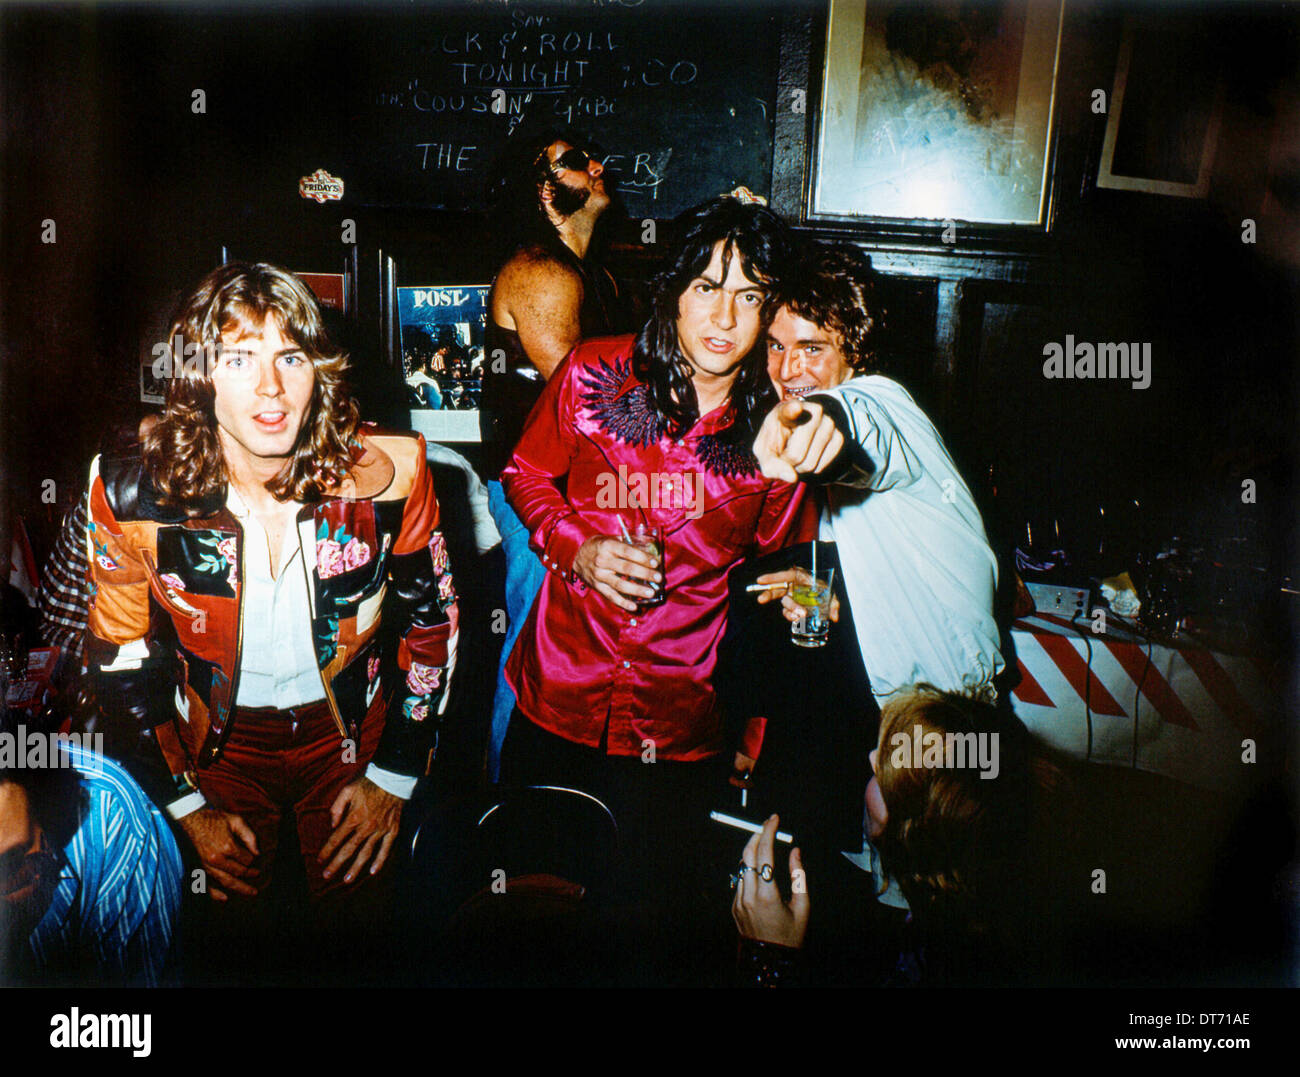 ALEX CHILTON JODY STEPHENS & ANDY HUMMEL BIG STAR: NOTHING CAN HURT ME (2012) - Stock Image